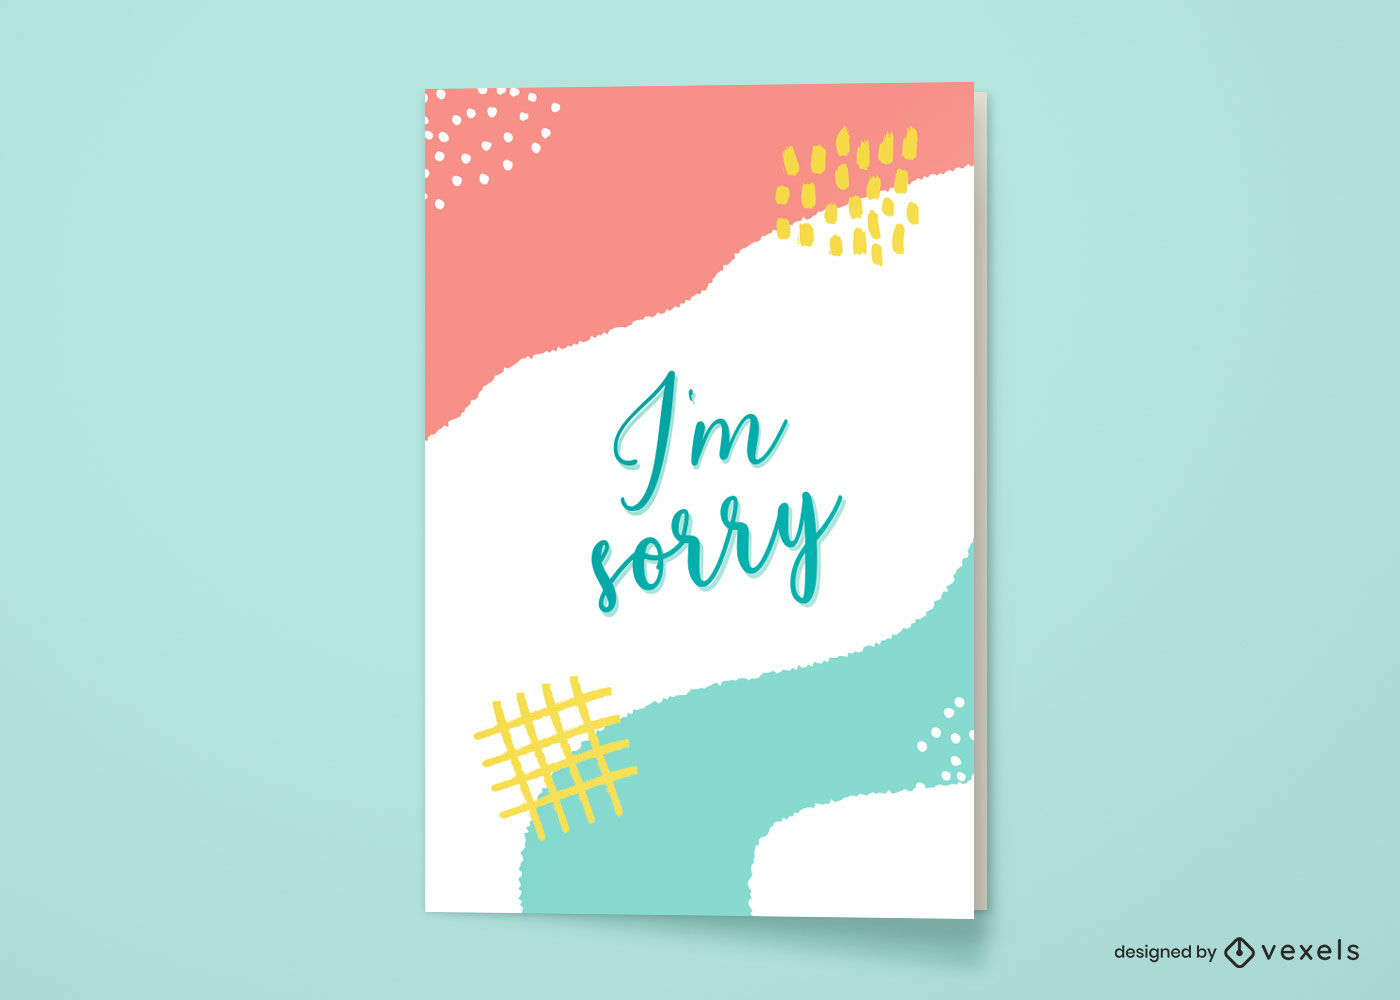 Es tut mir leid Grußkarte abstraktes Design